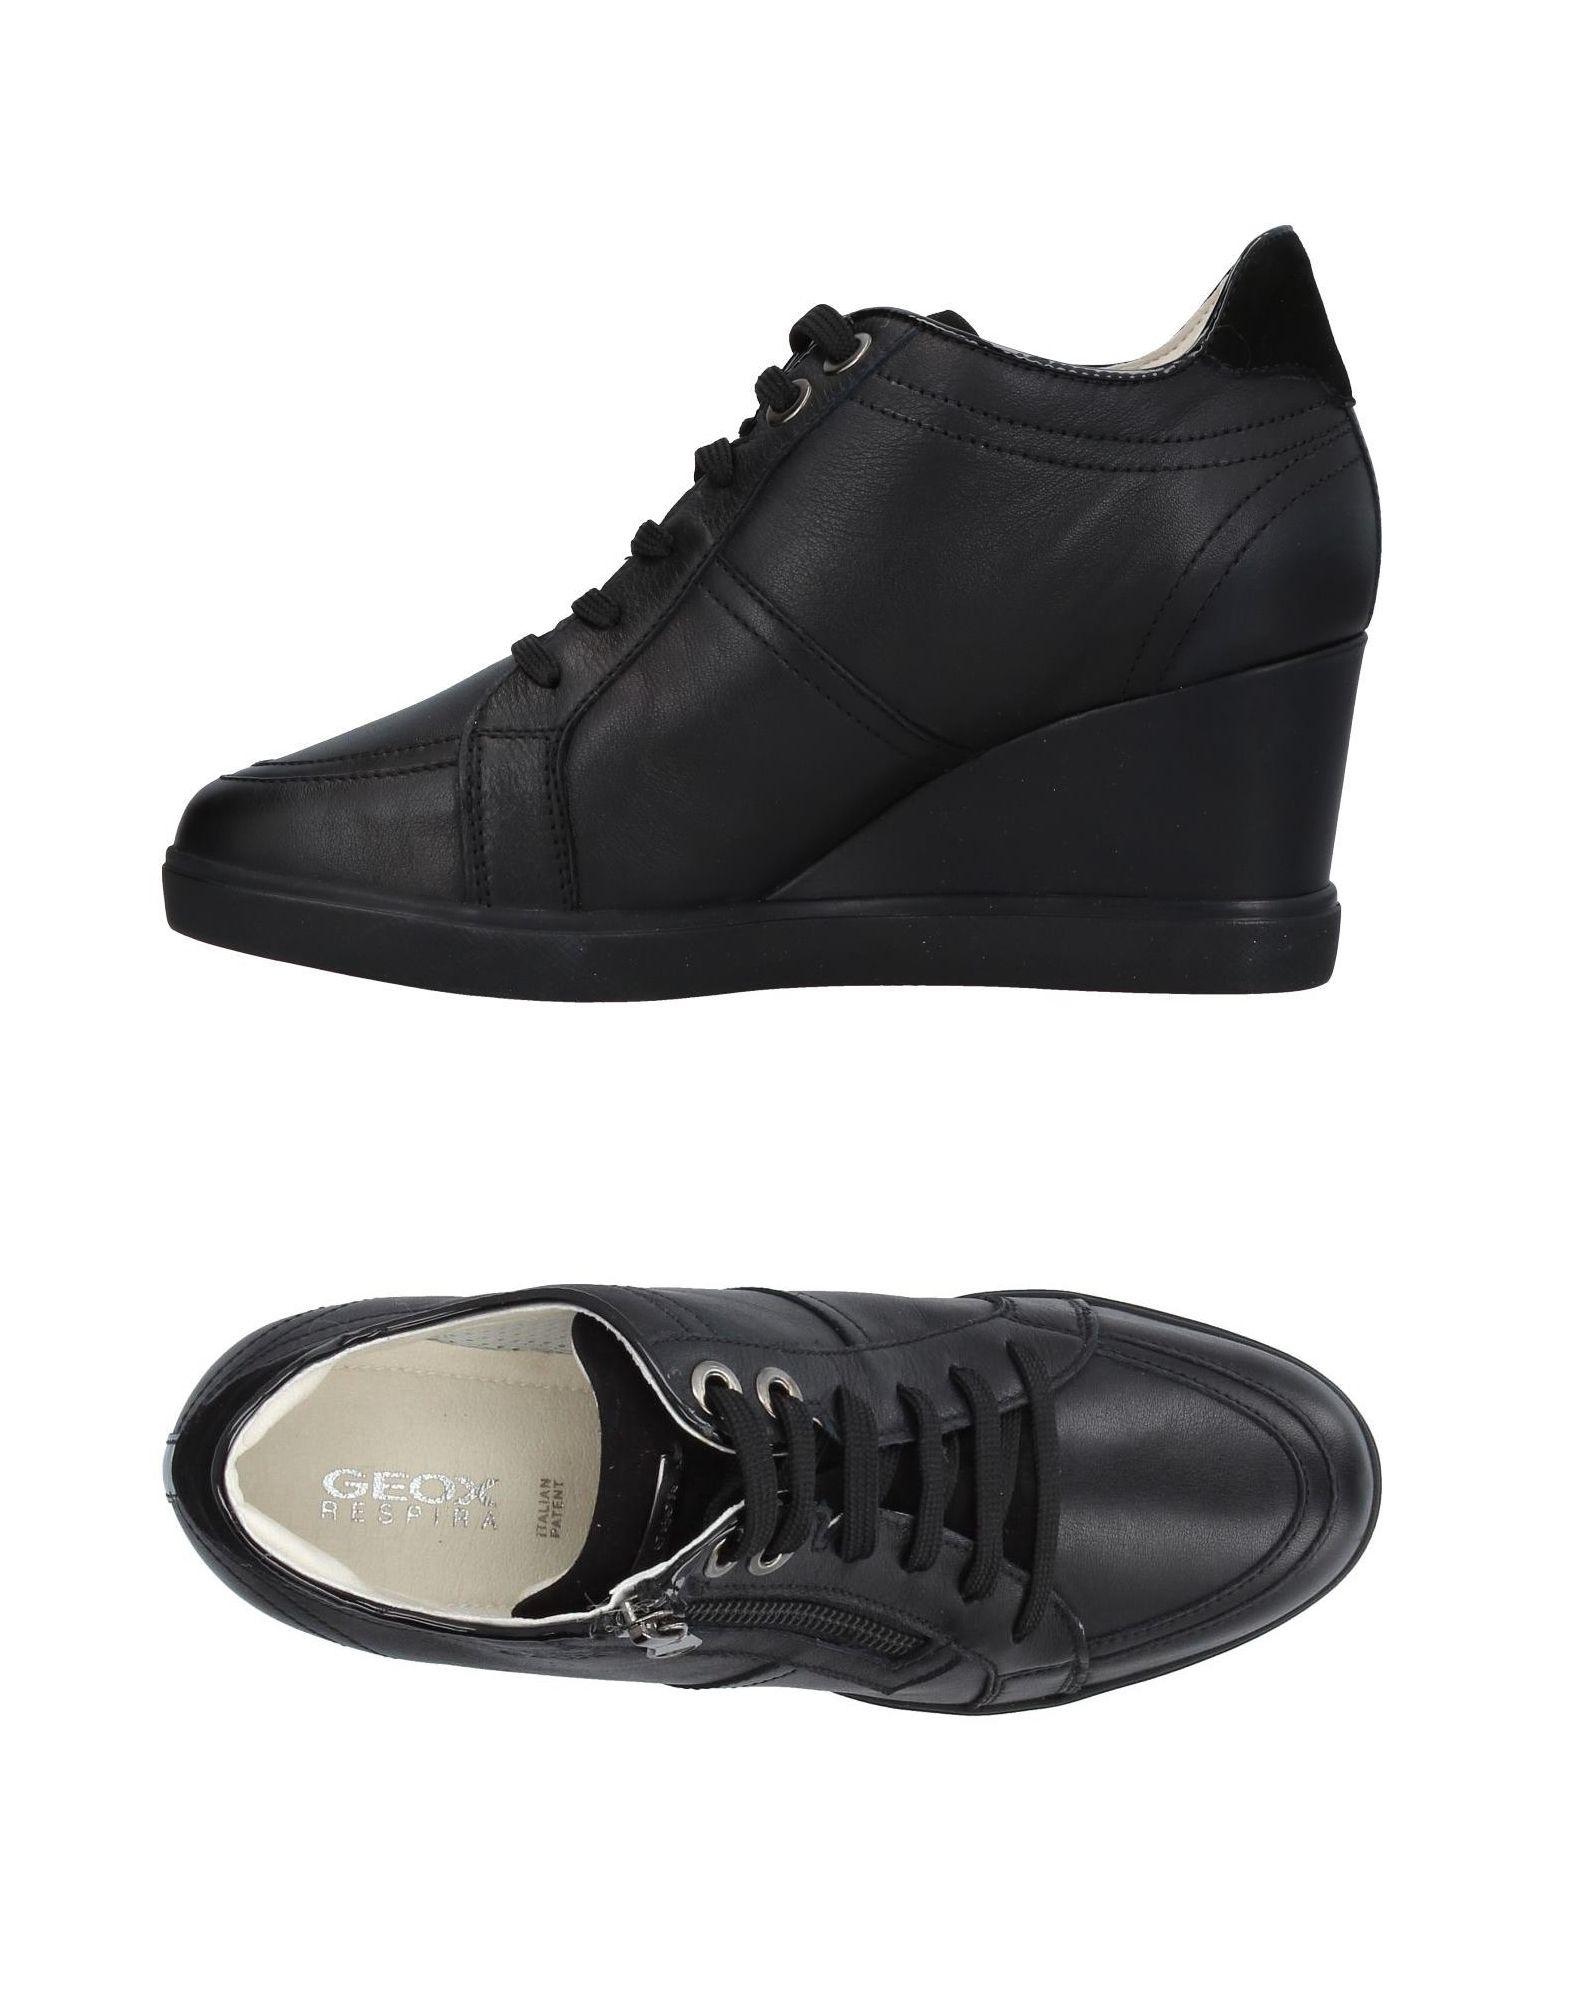 Sneakers Geox Donna - 11392420AV elegante